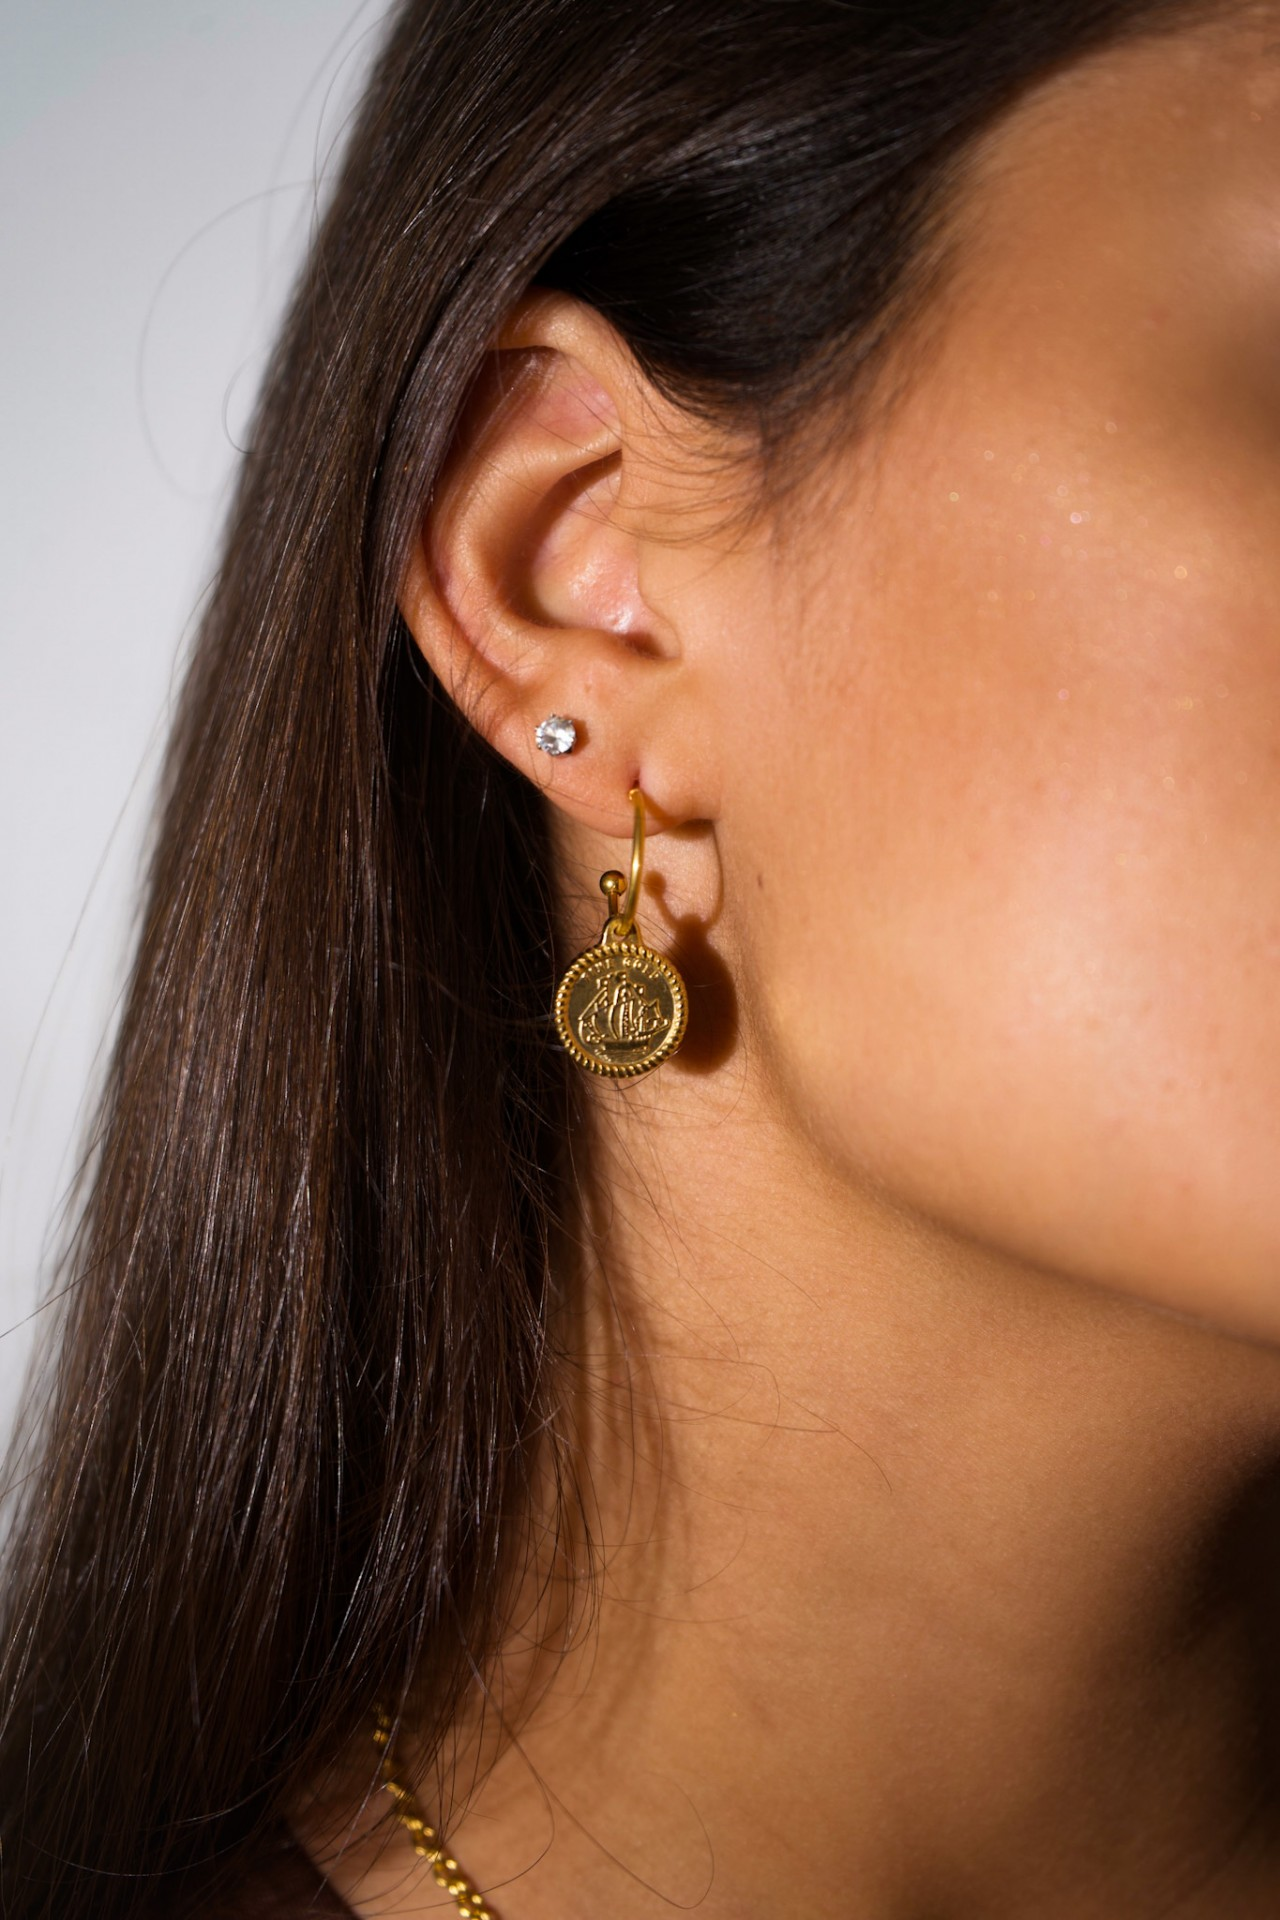 Sea Salt Earrings - ACTO DESIGN